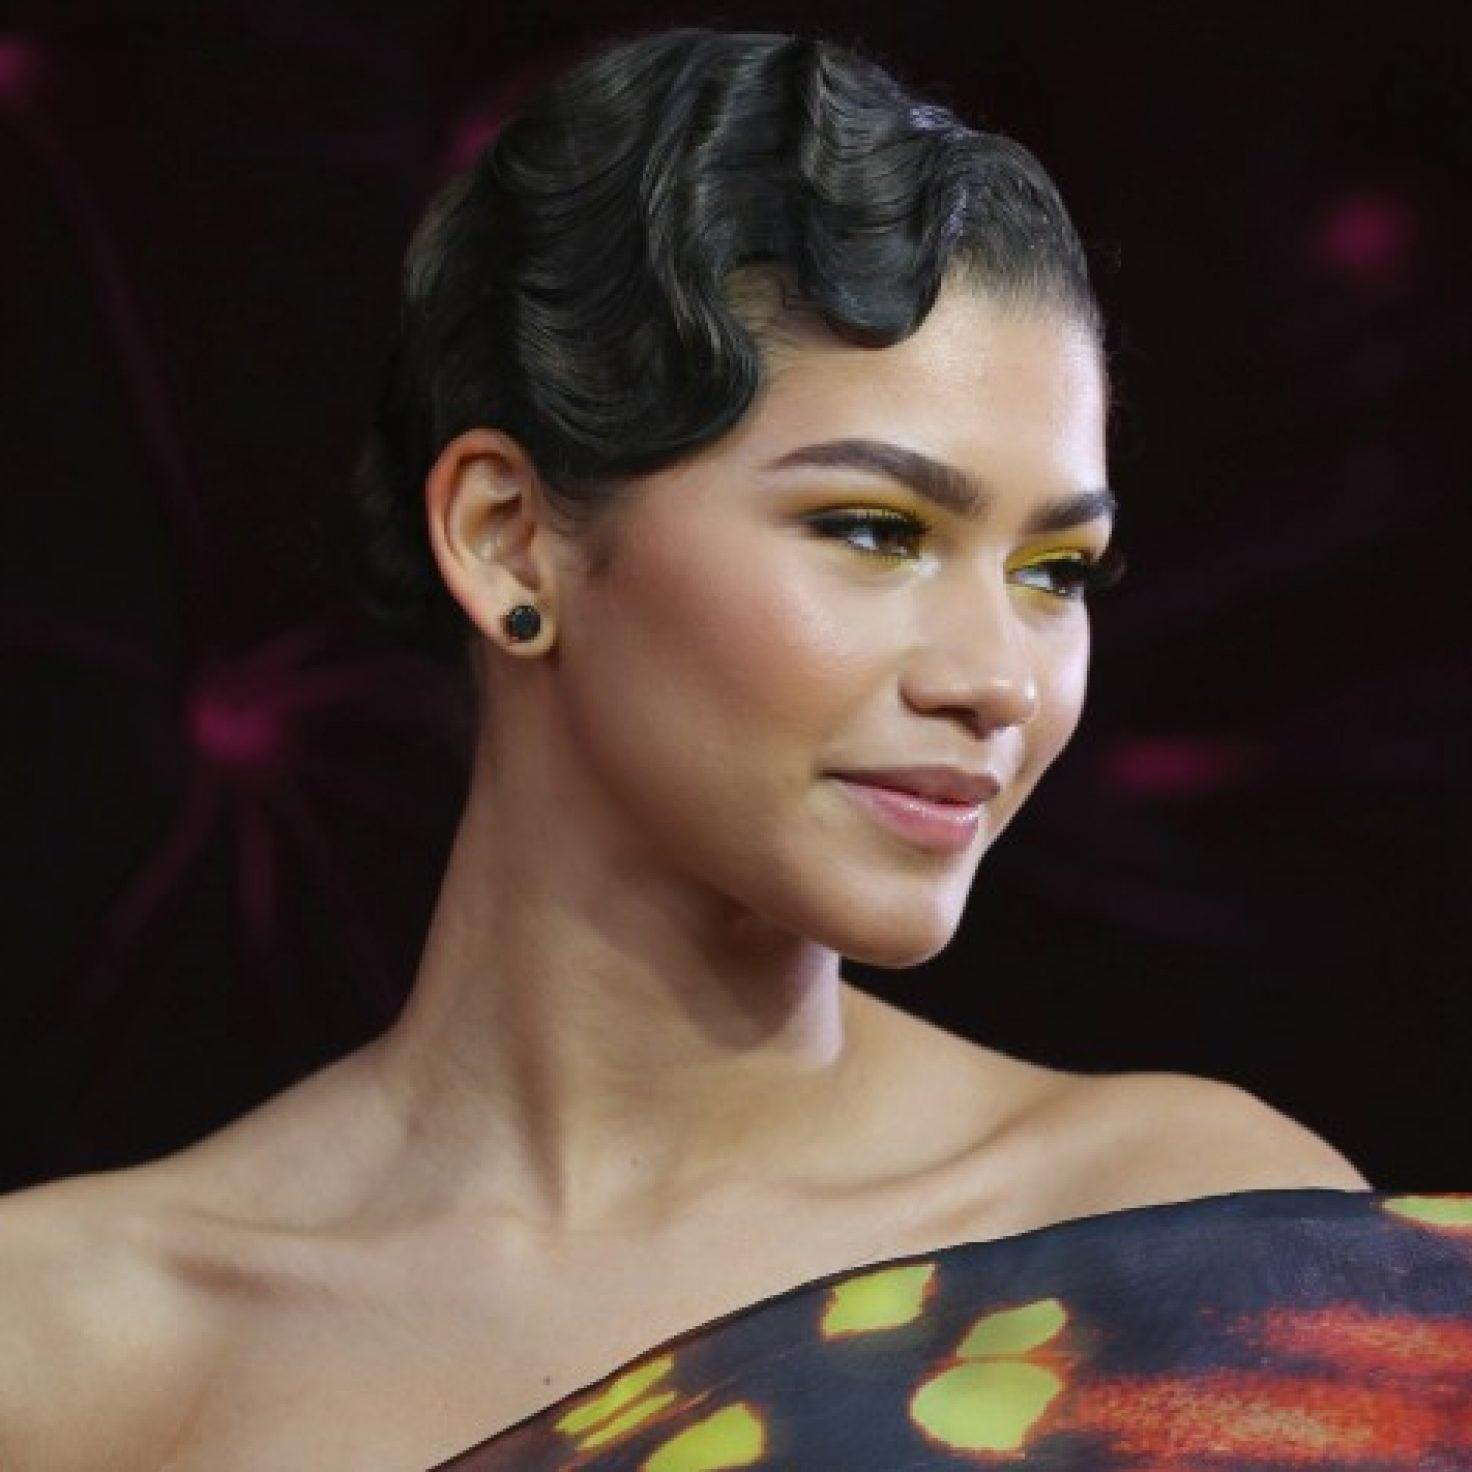 5 Nineties Hairstyles To Practice On Natural Hair During Quarantine